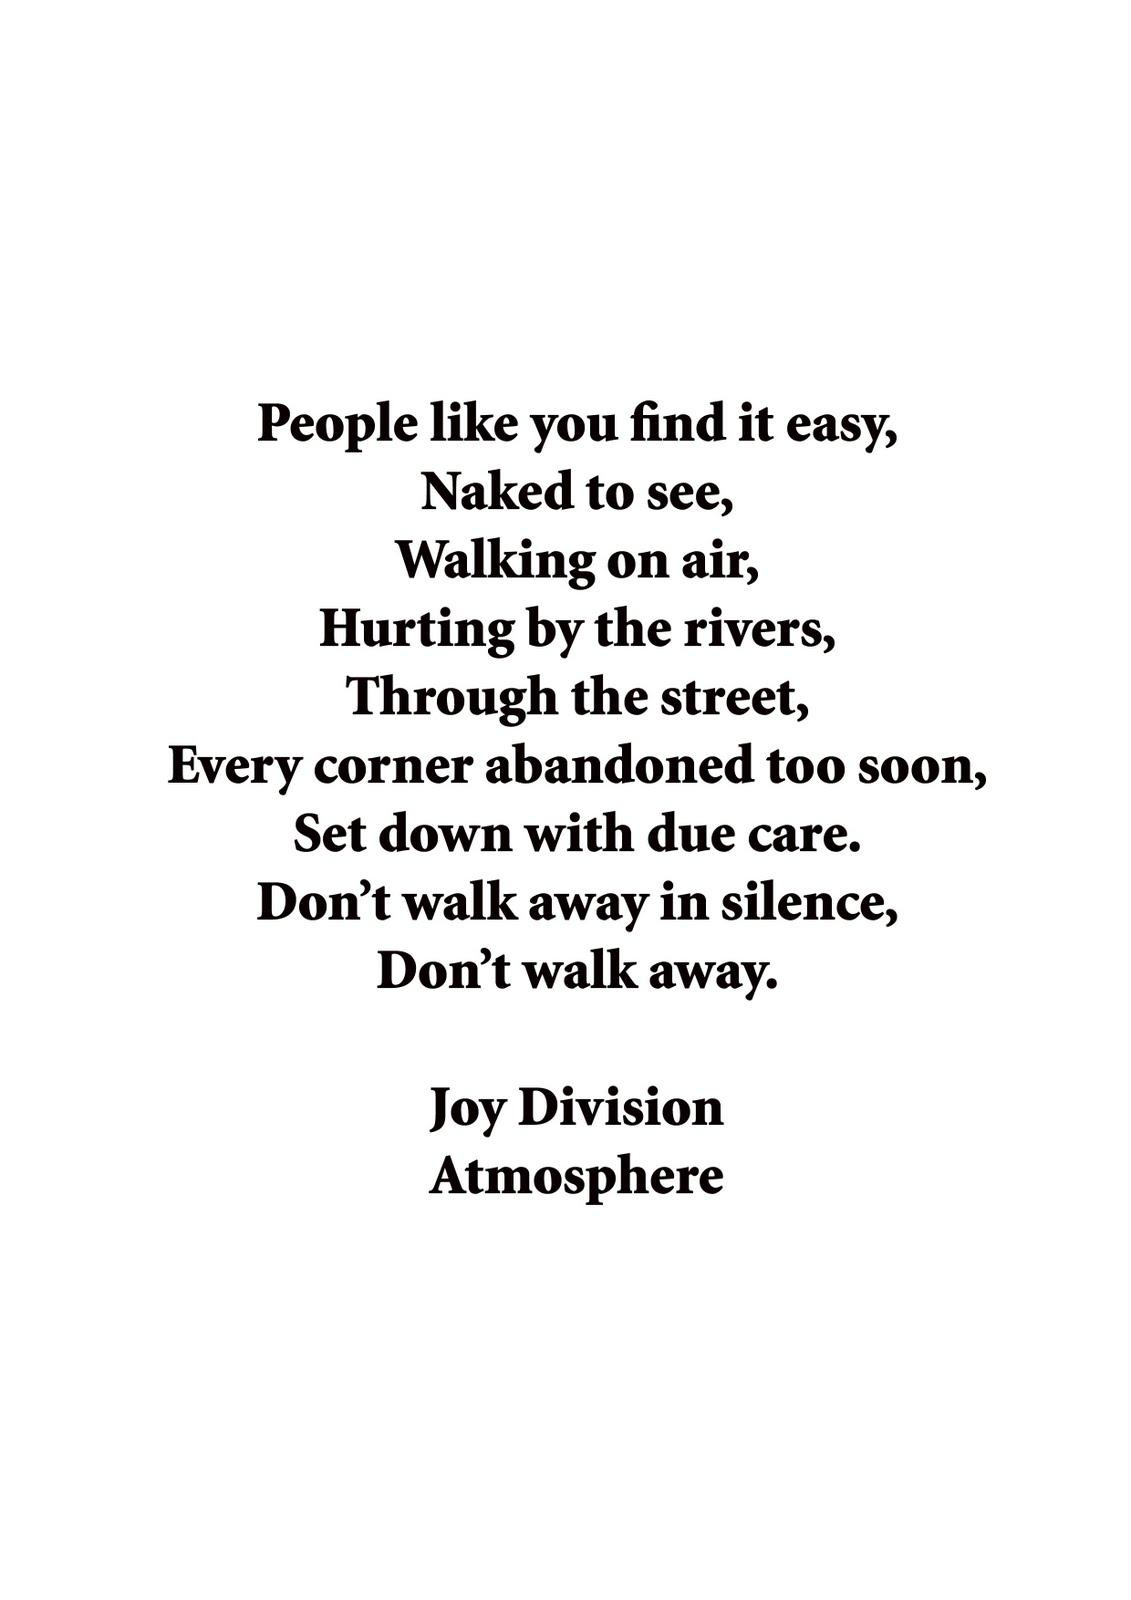 atmosphere lyrics - DriverLayer Search Engine